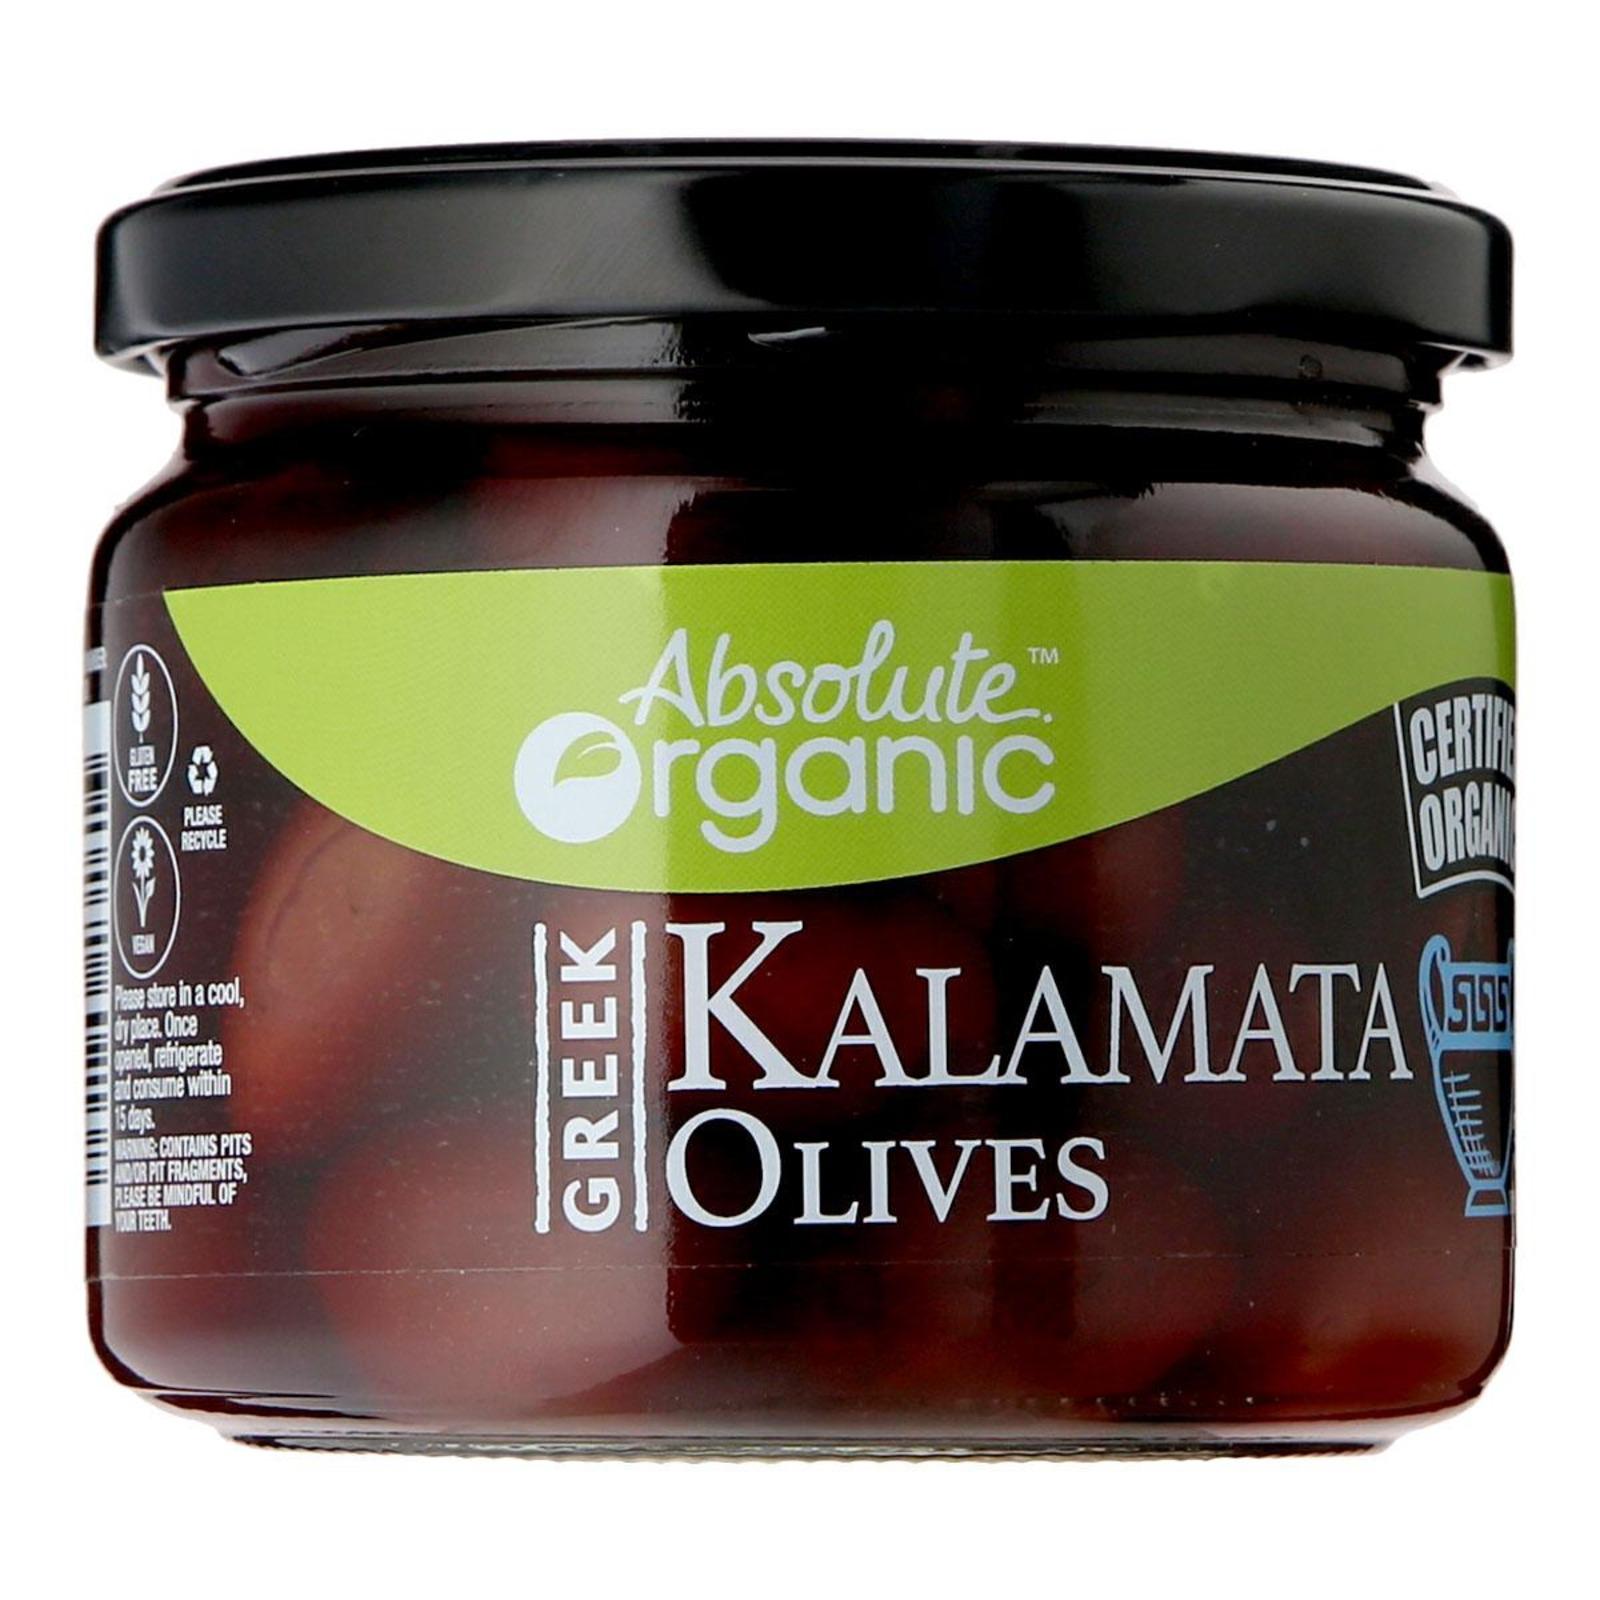 Absolute Organic Whole Olives Kalamata